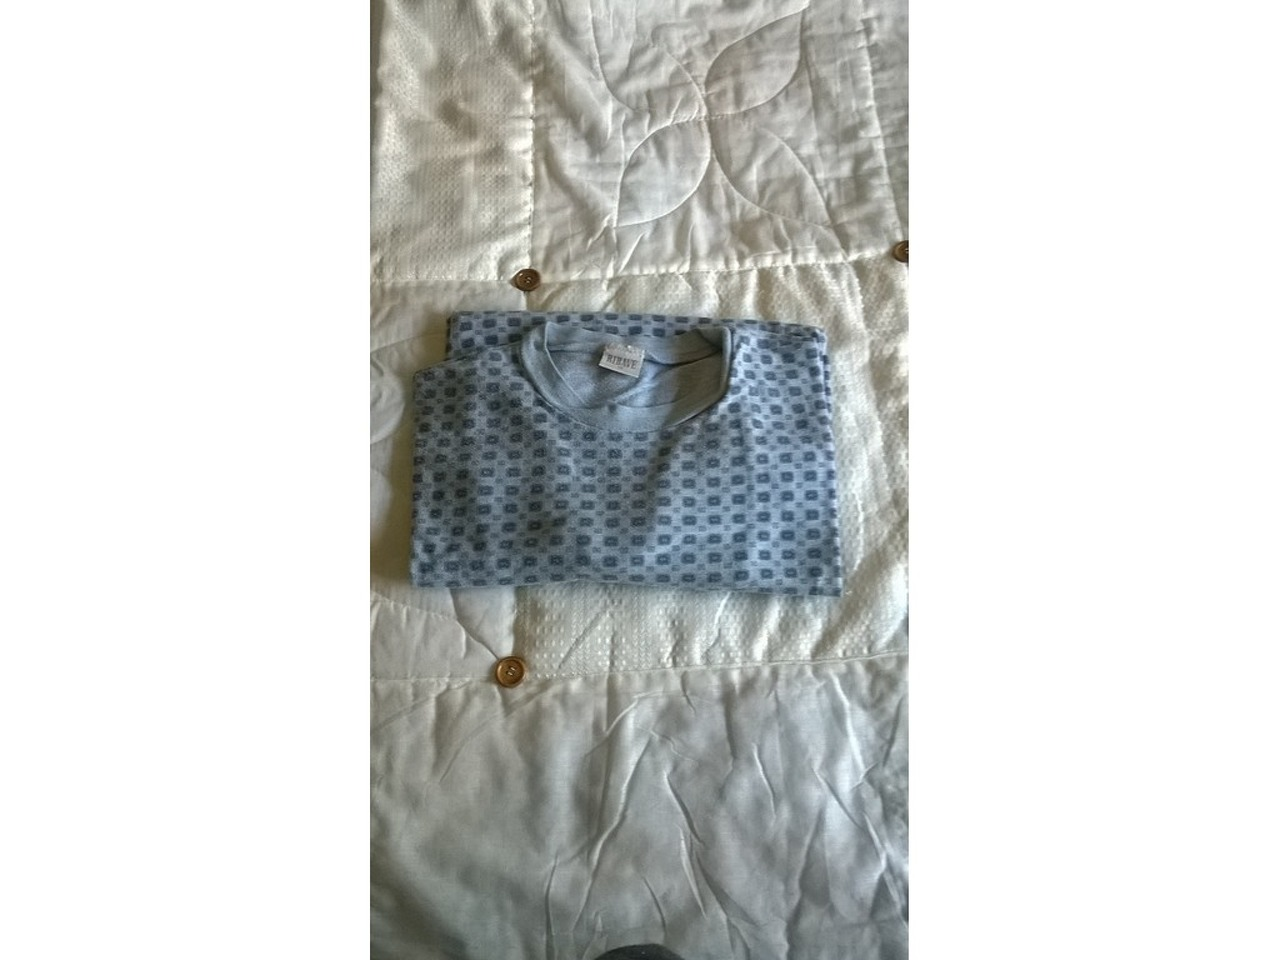 Pijamas (segunda mão) - 12/12